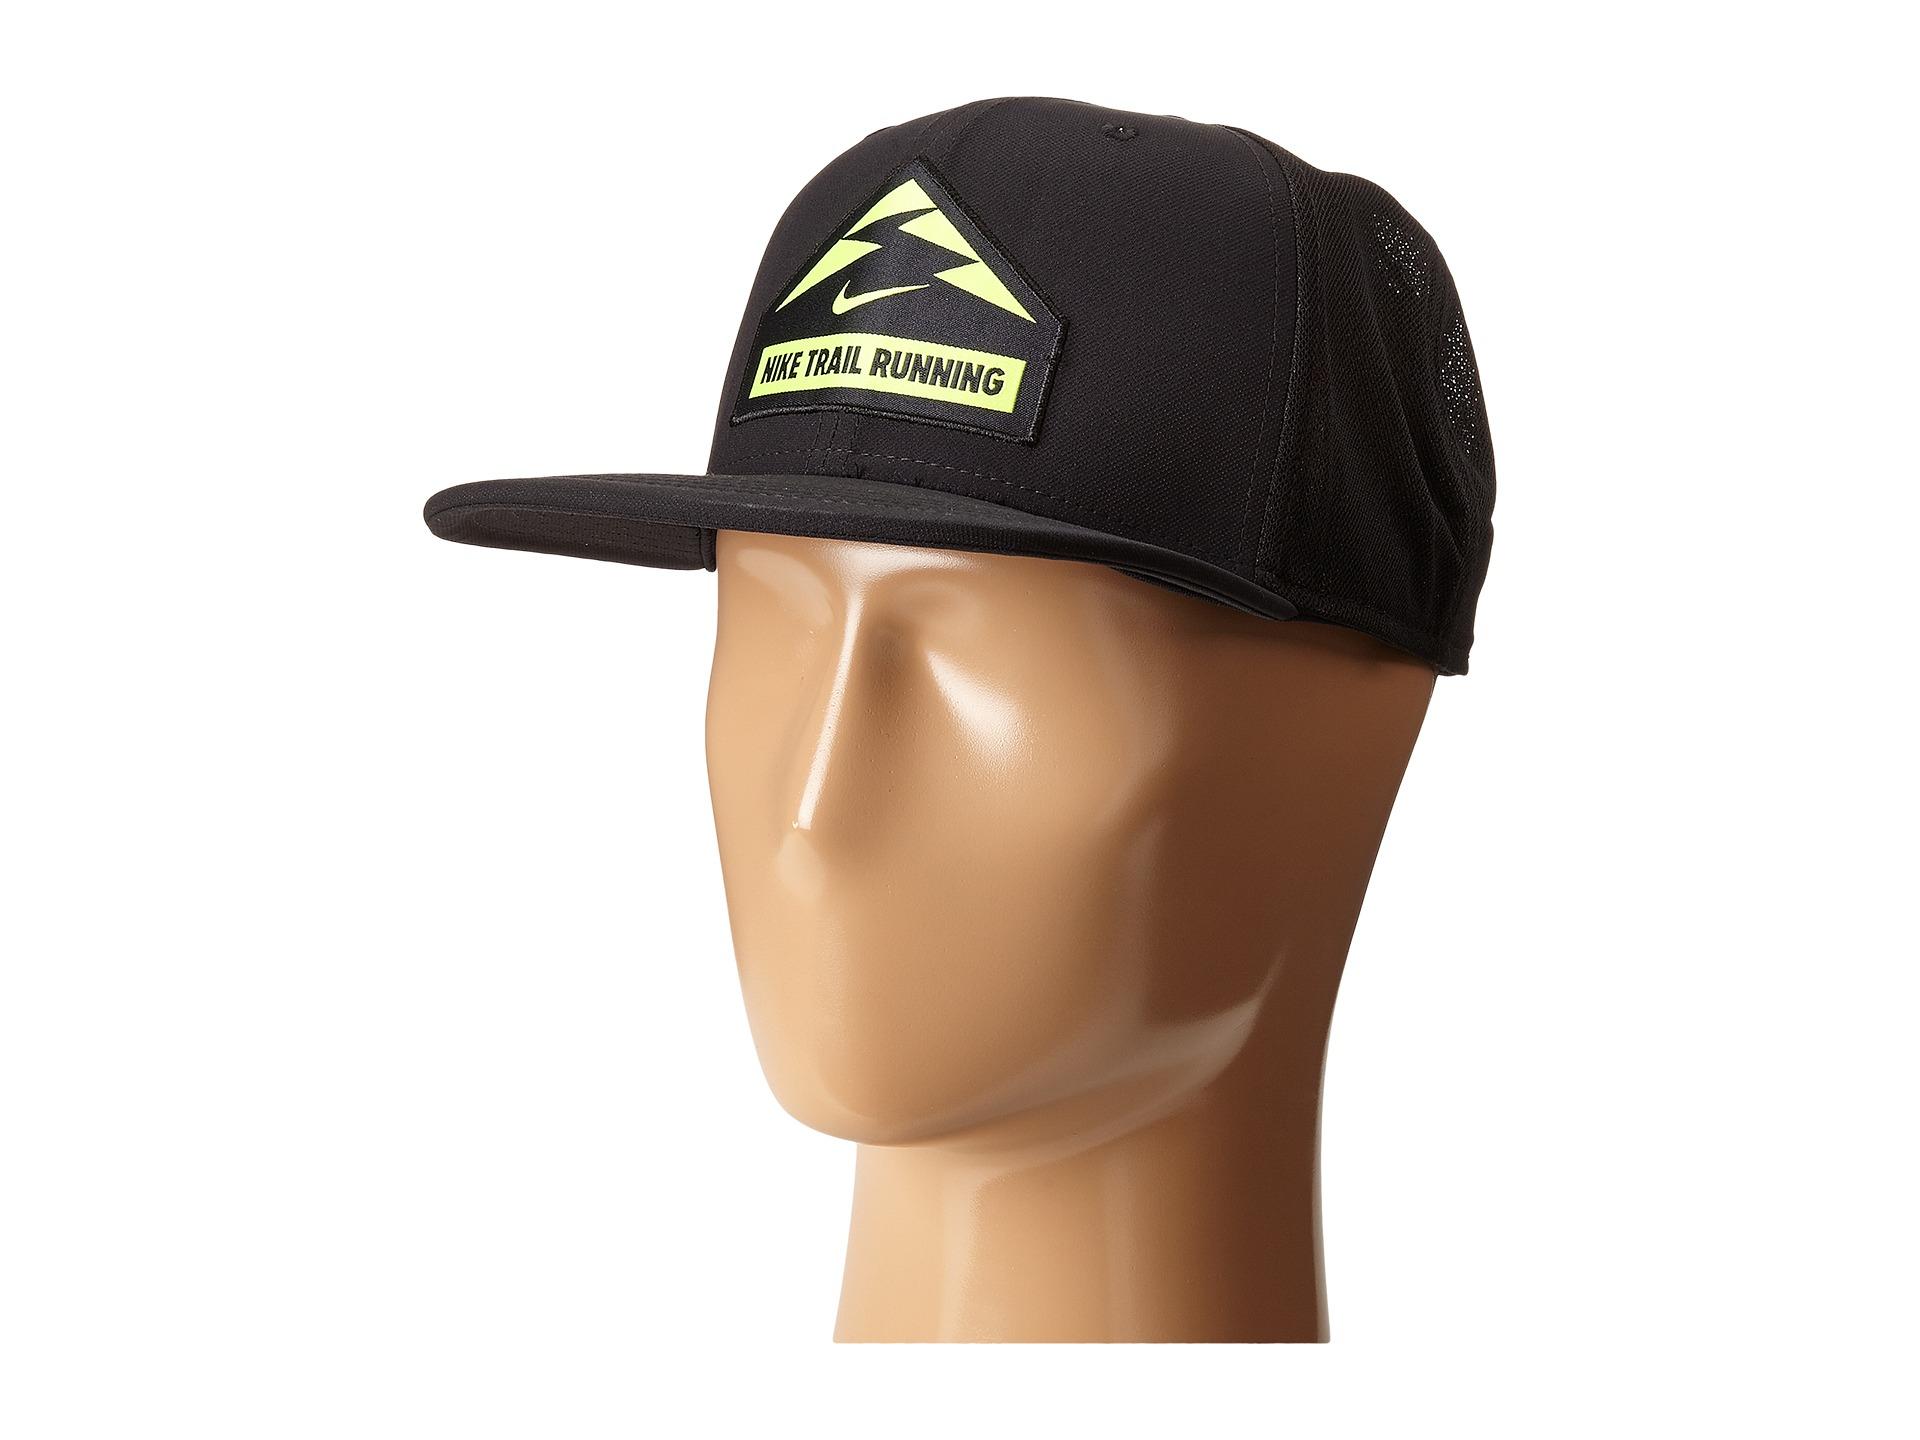 c93efec51fb Lyst - Nike Trail Run Trucker Hat in Black for Men